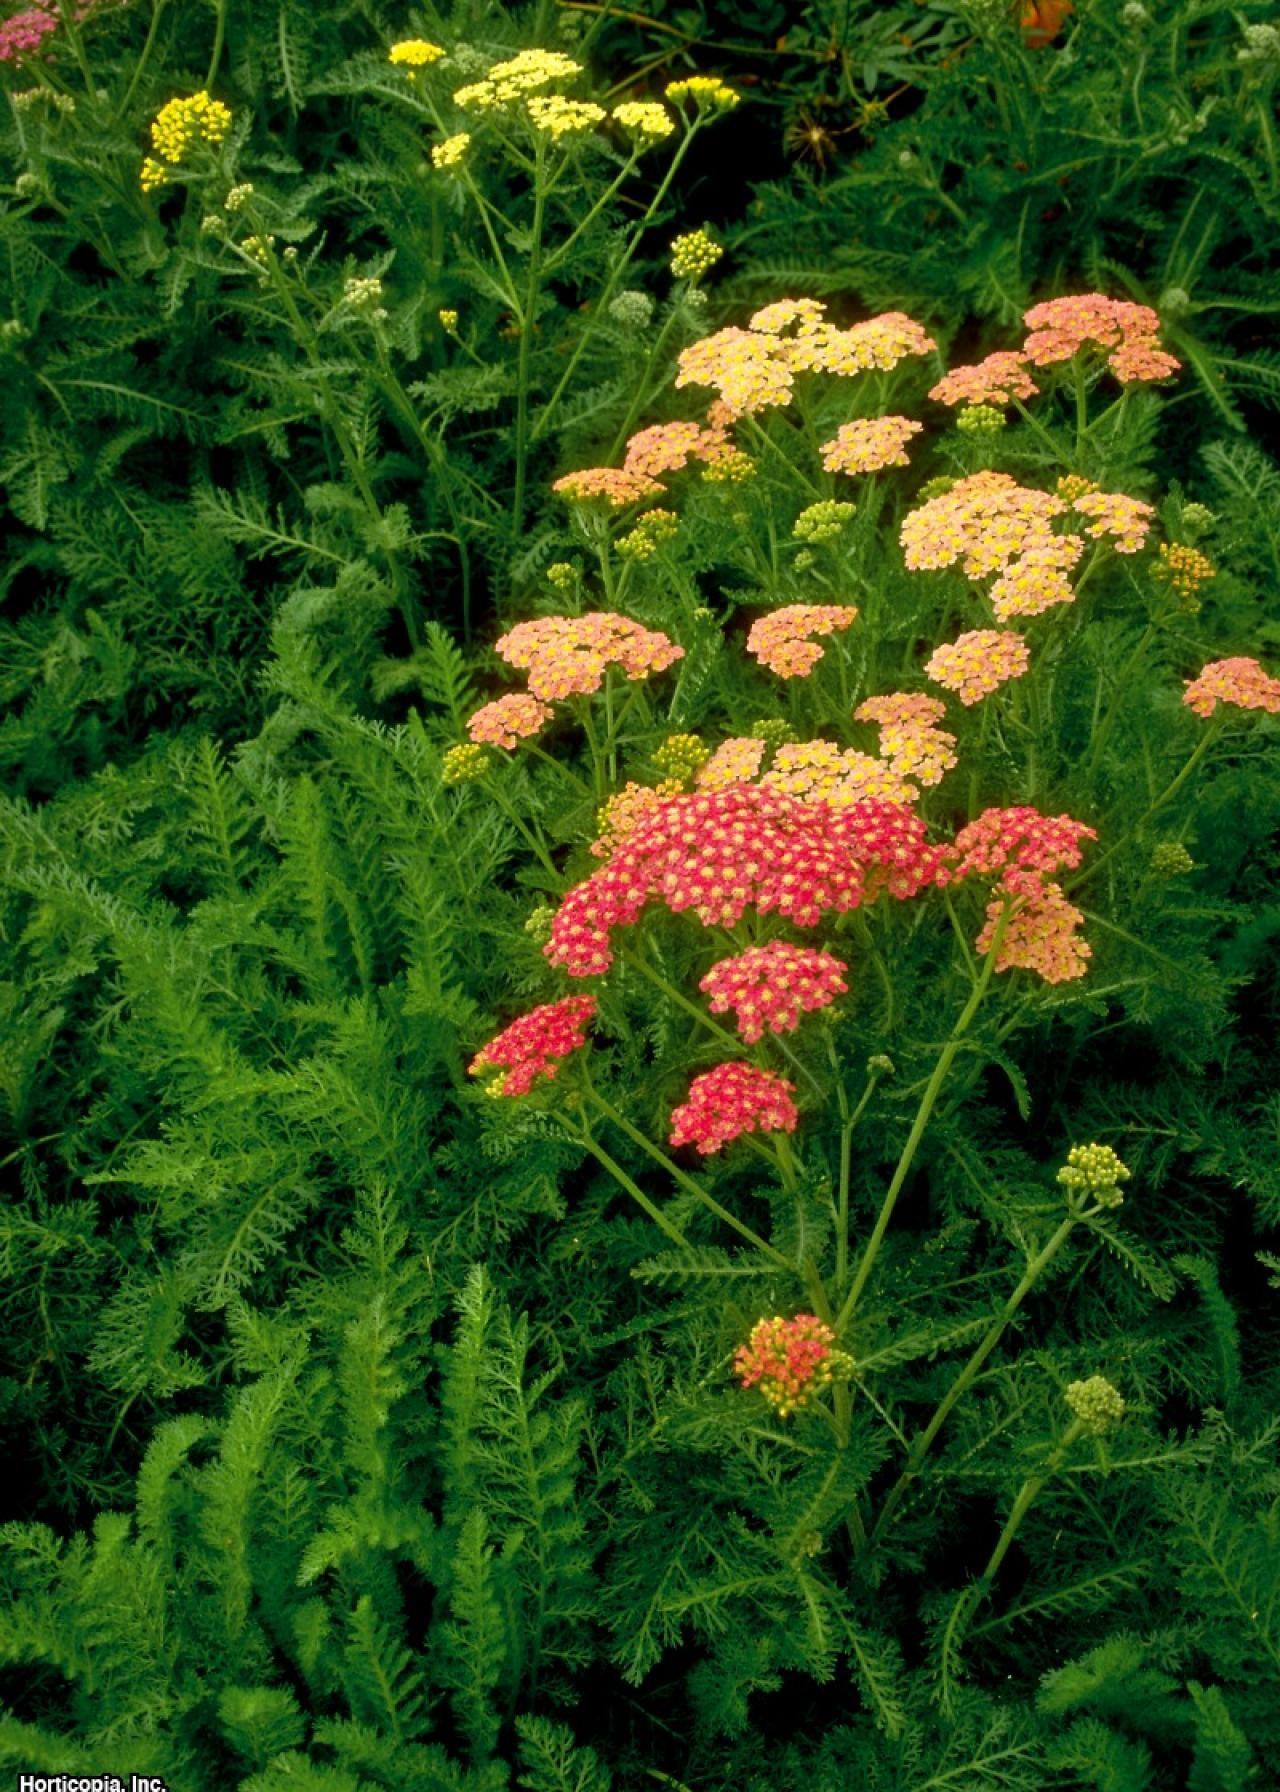 Yarrow Botanical Name Achillea Spp Plant Type Flower Sun Exposure Full Sun Soil Type Loamy Sandy Soil Ph Varies Bloom Ti In 2020 Yarrow Plant Plants Yarrow Flower